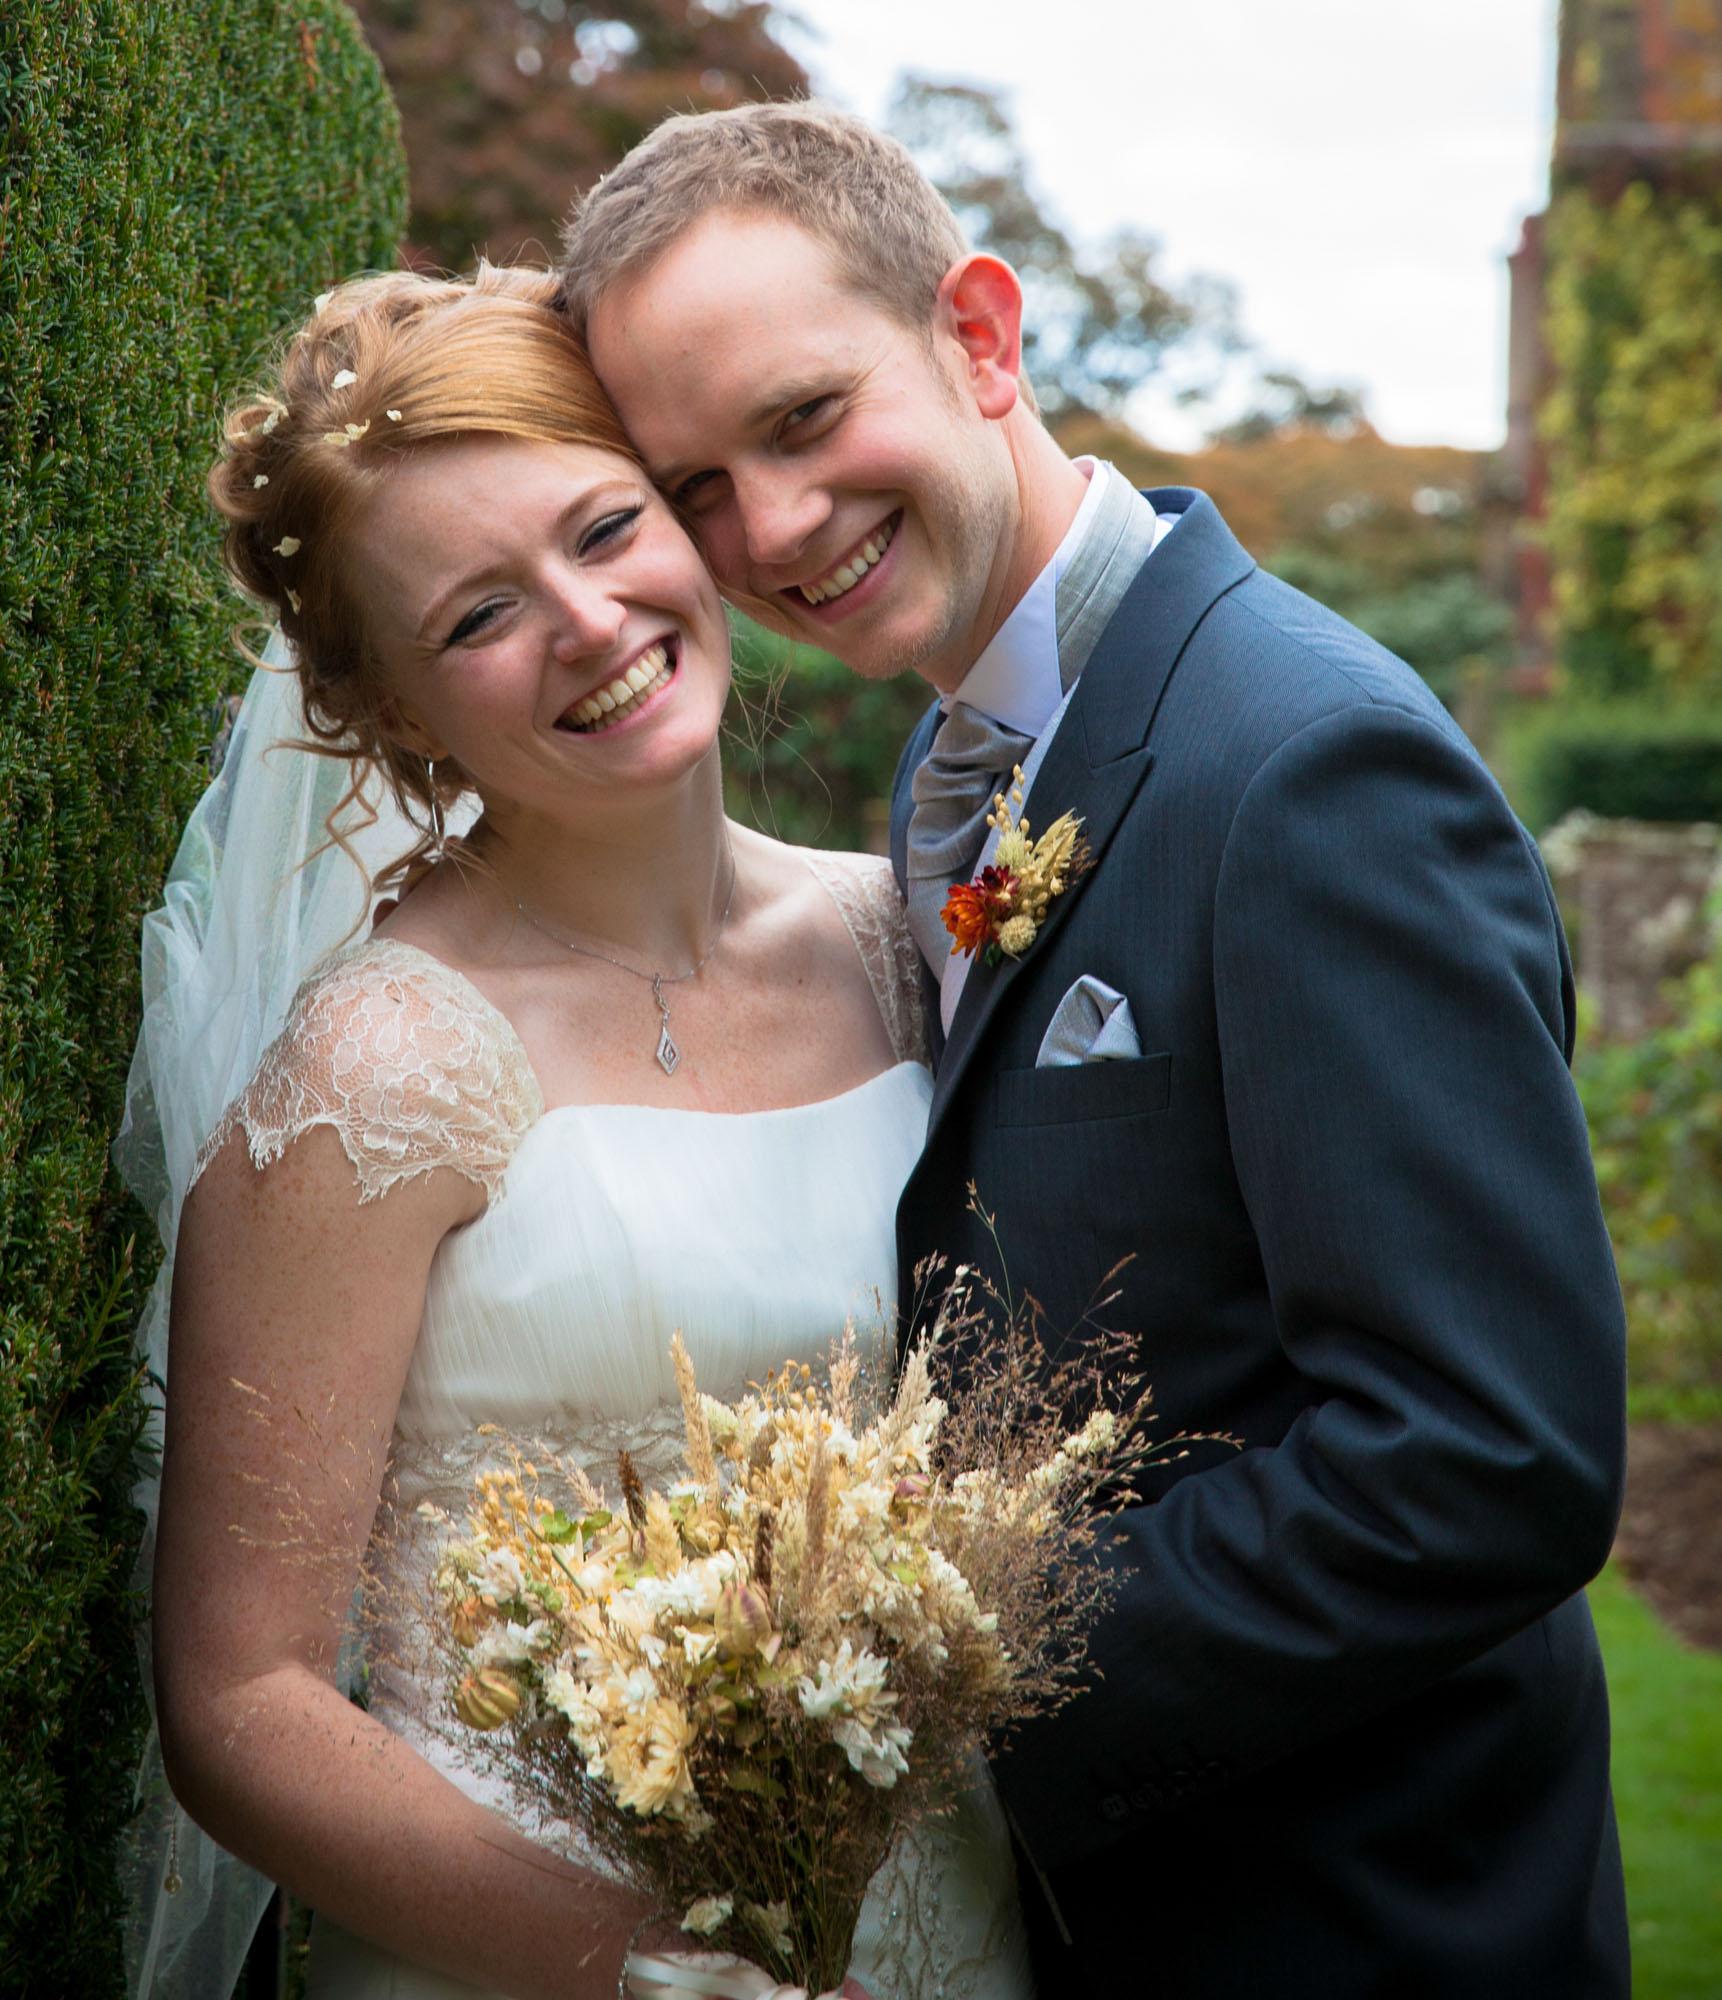 weddings-couples-love-photographer-oxford-london-jonathan-self-photography-79.jpg